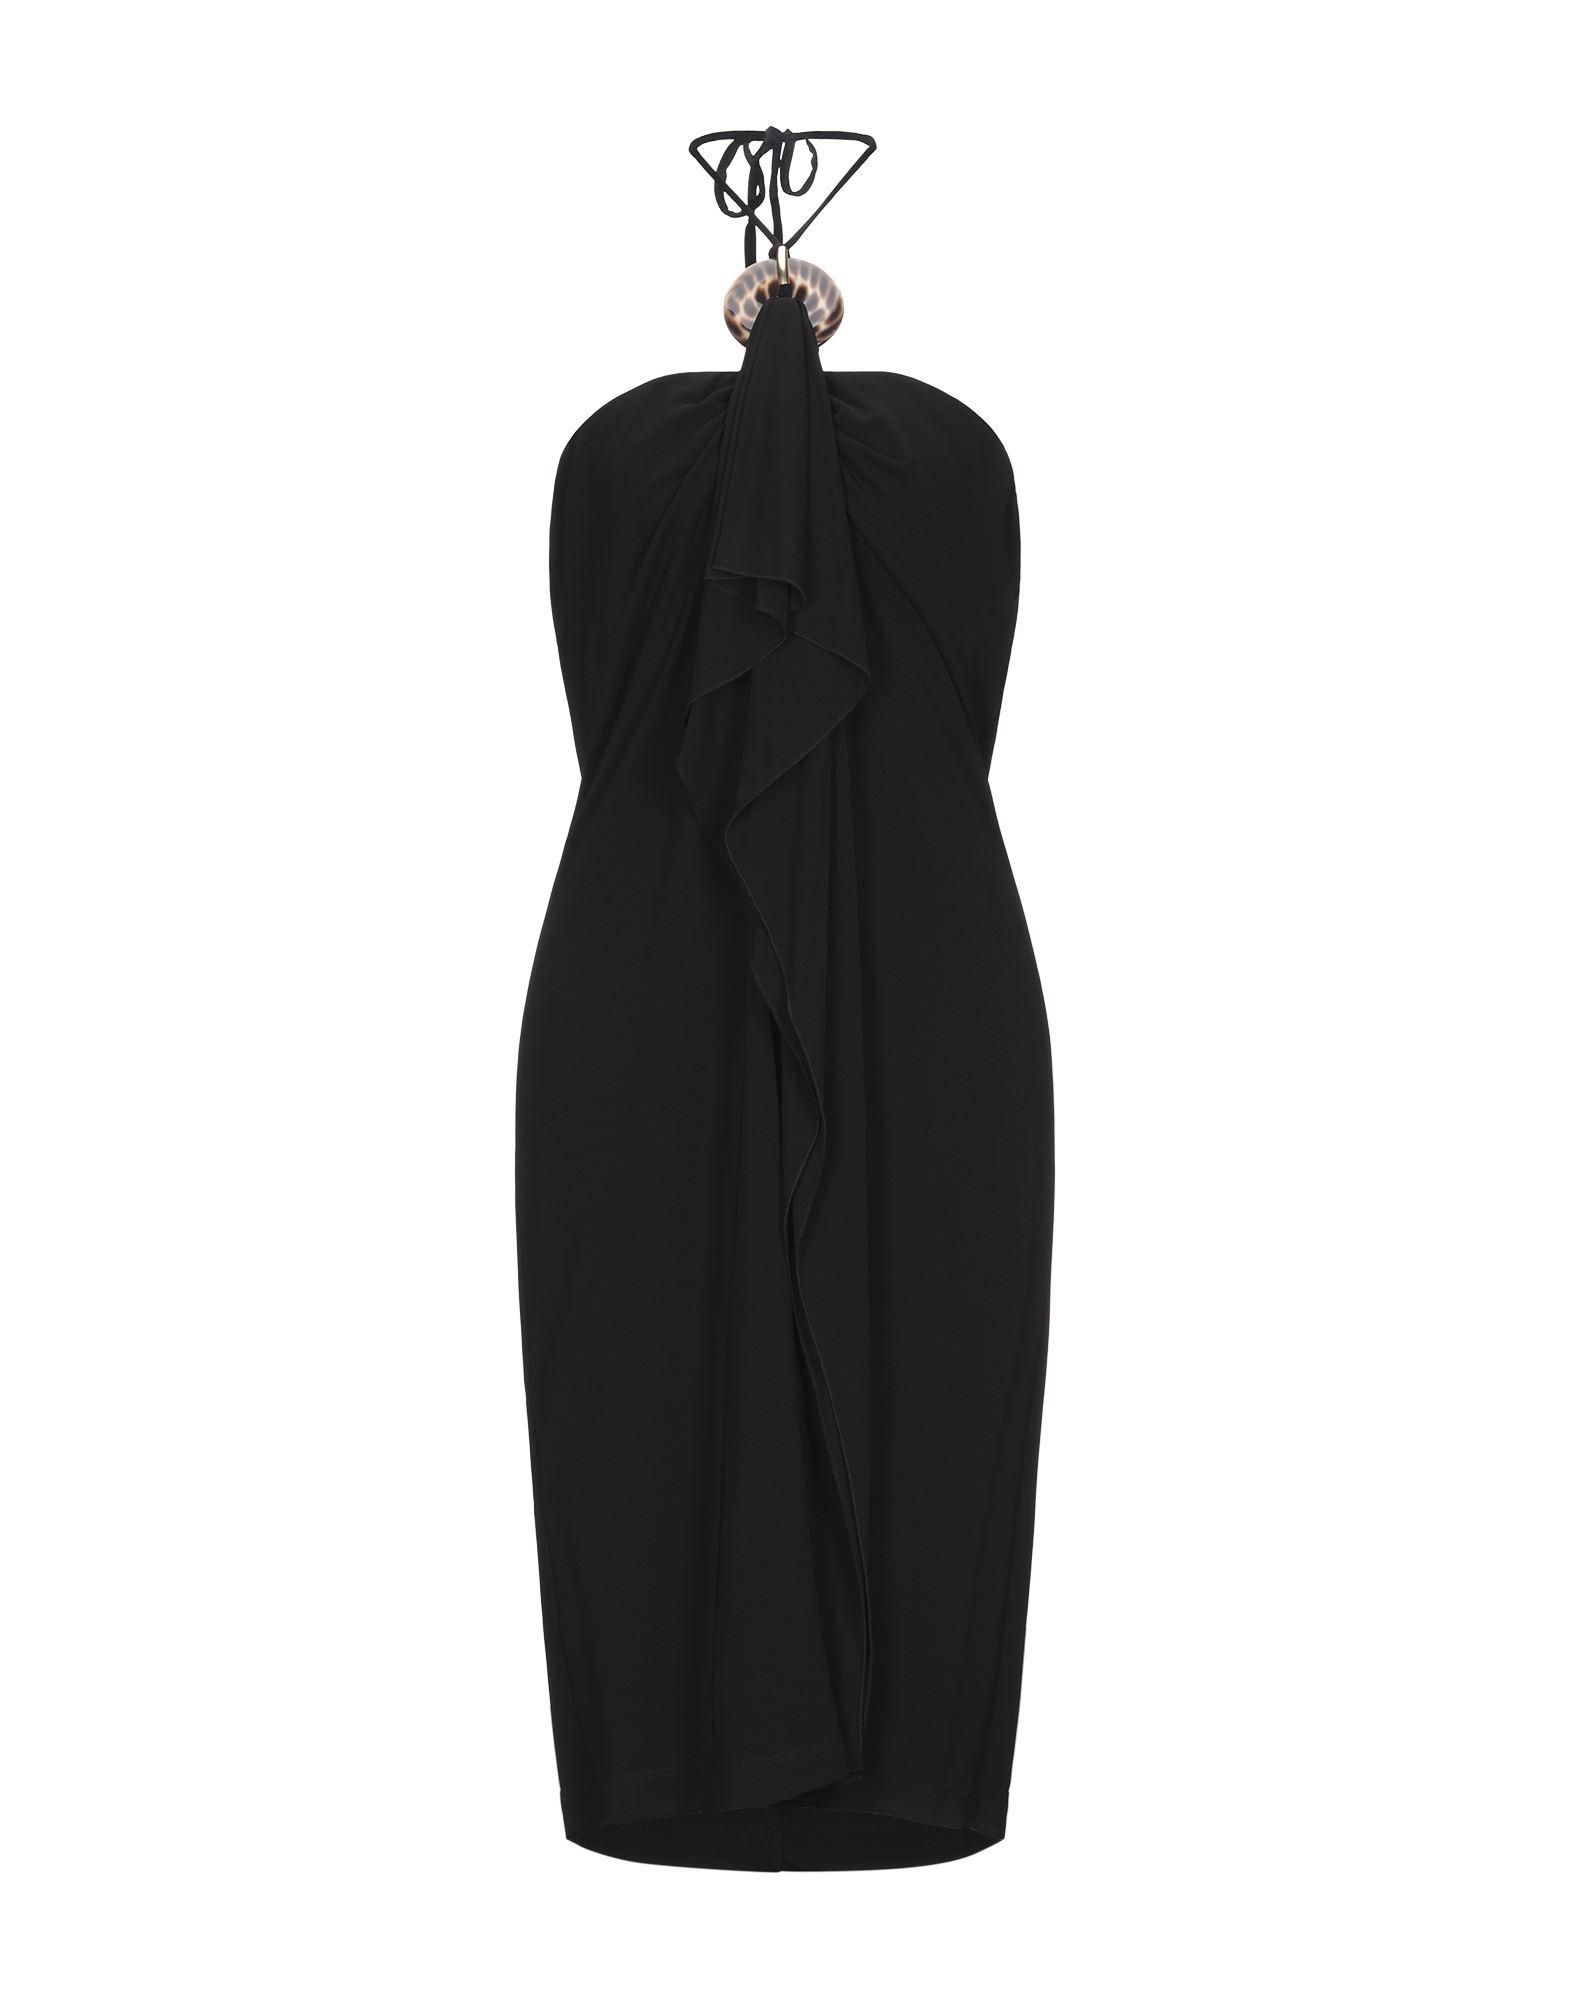 Фото - CLIPS Платье до колена gold case платье до колена